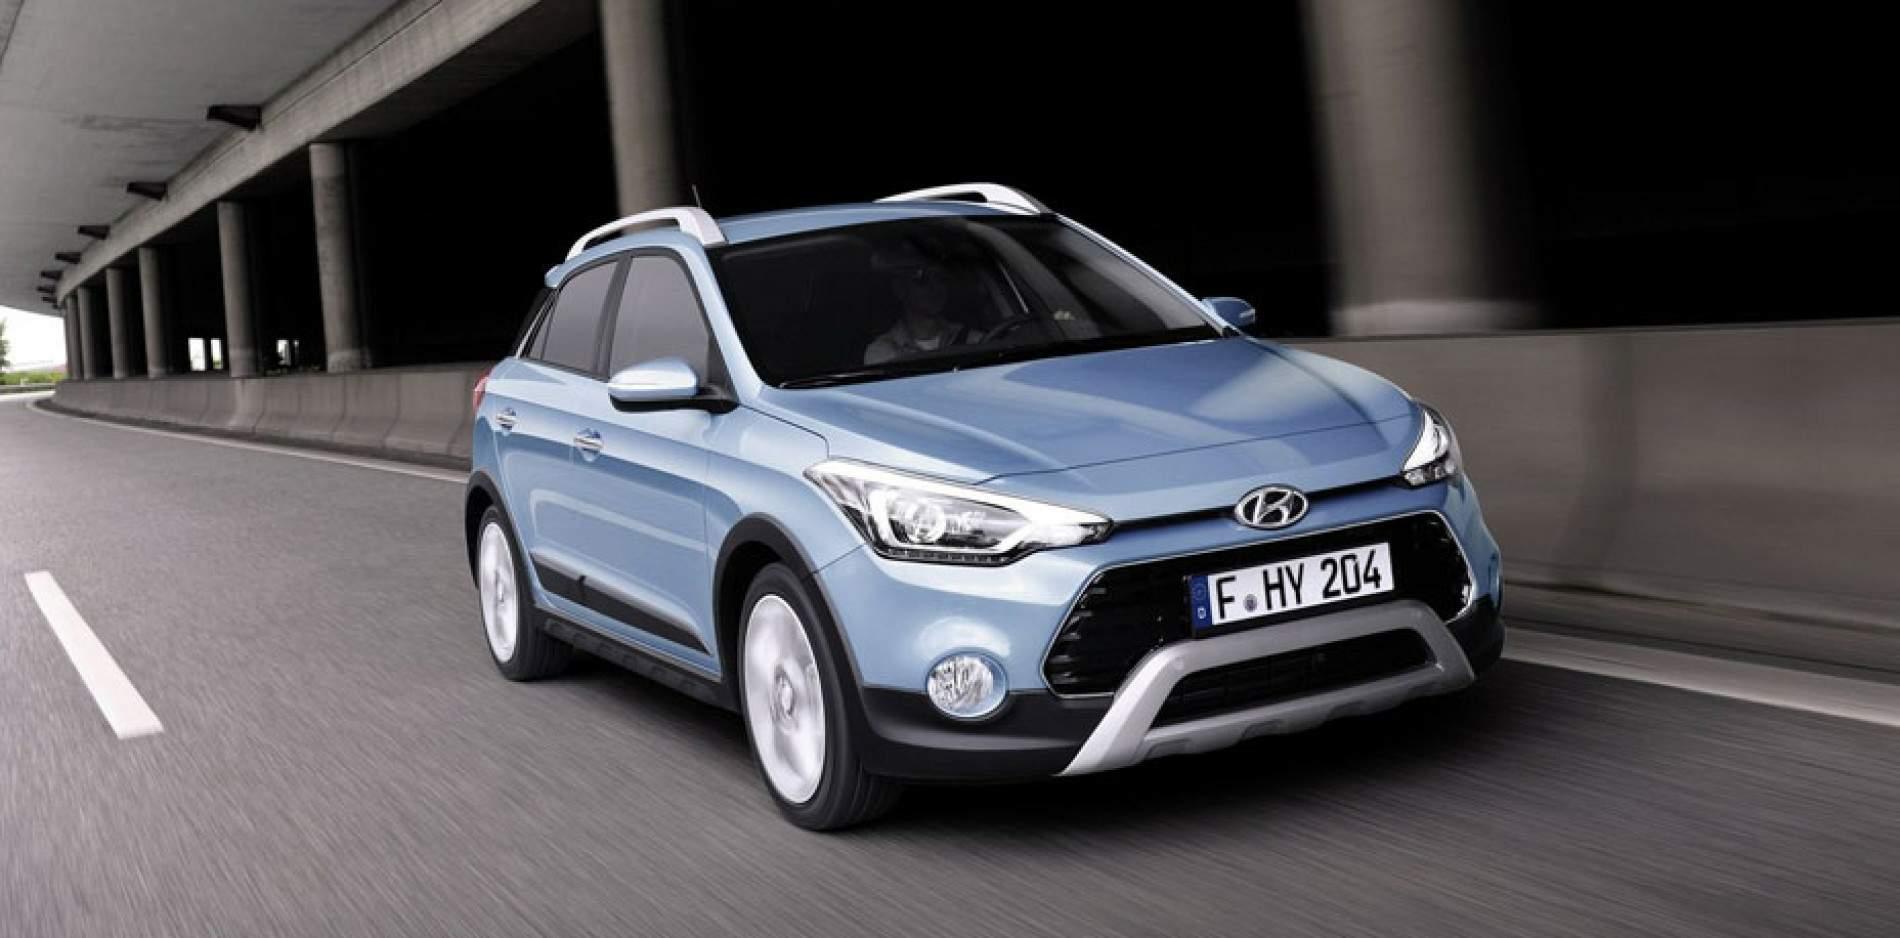 Hyundai i20 Active: El coreano irreverente